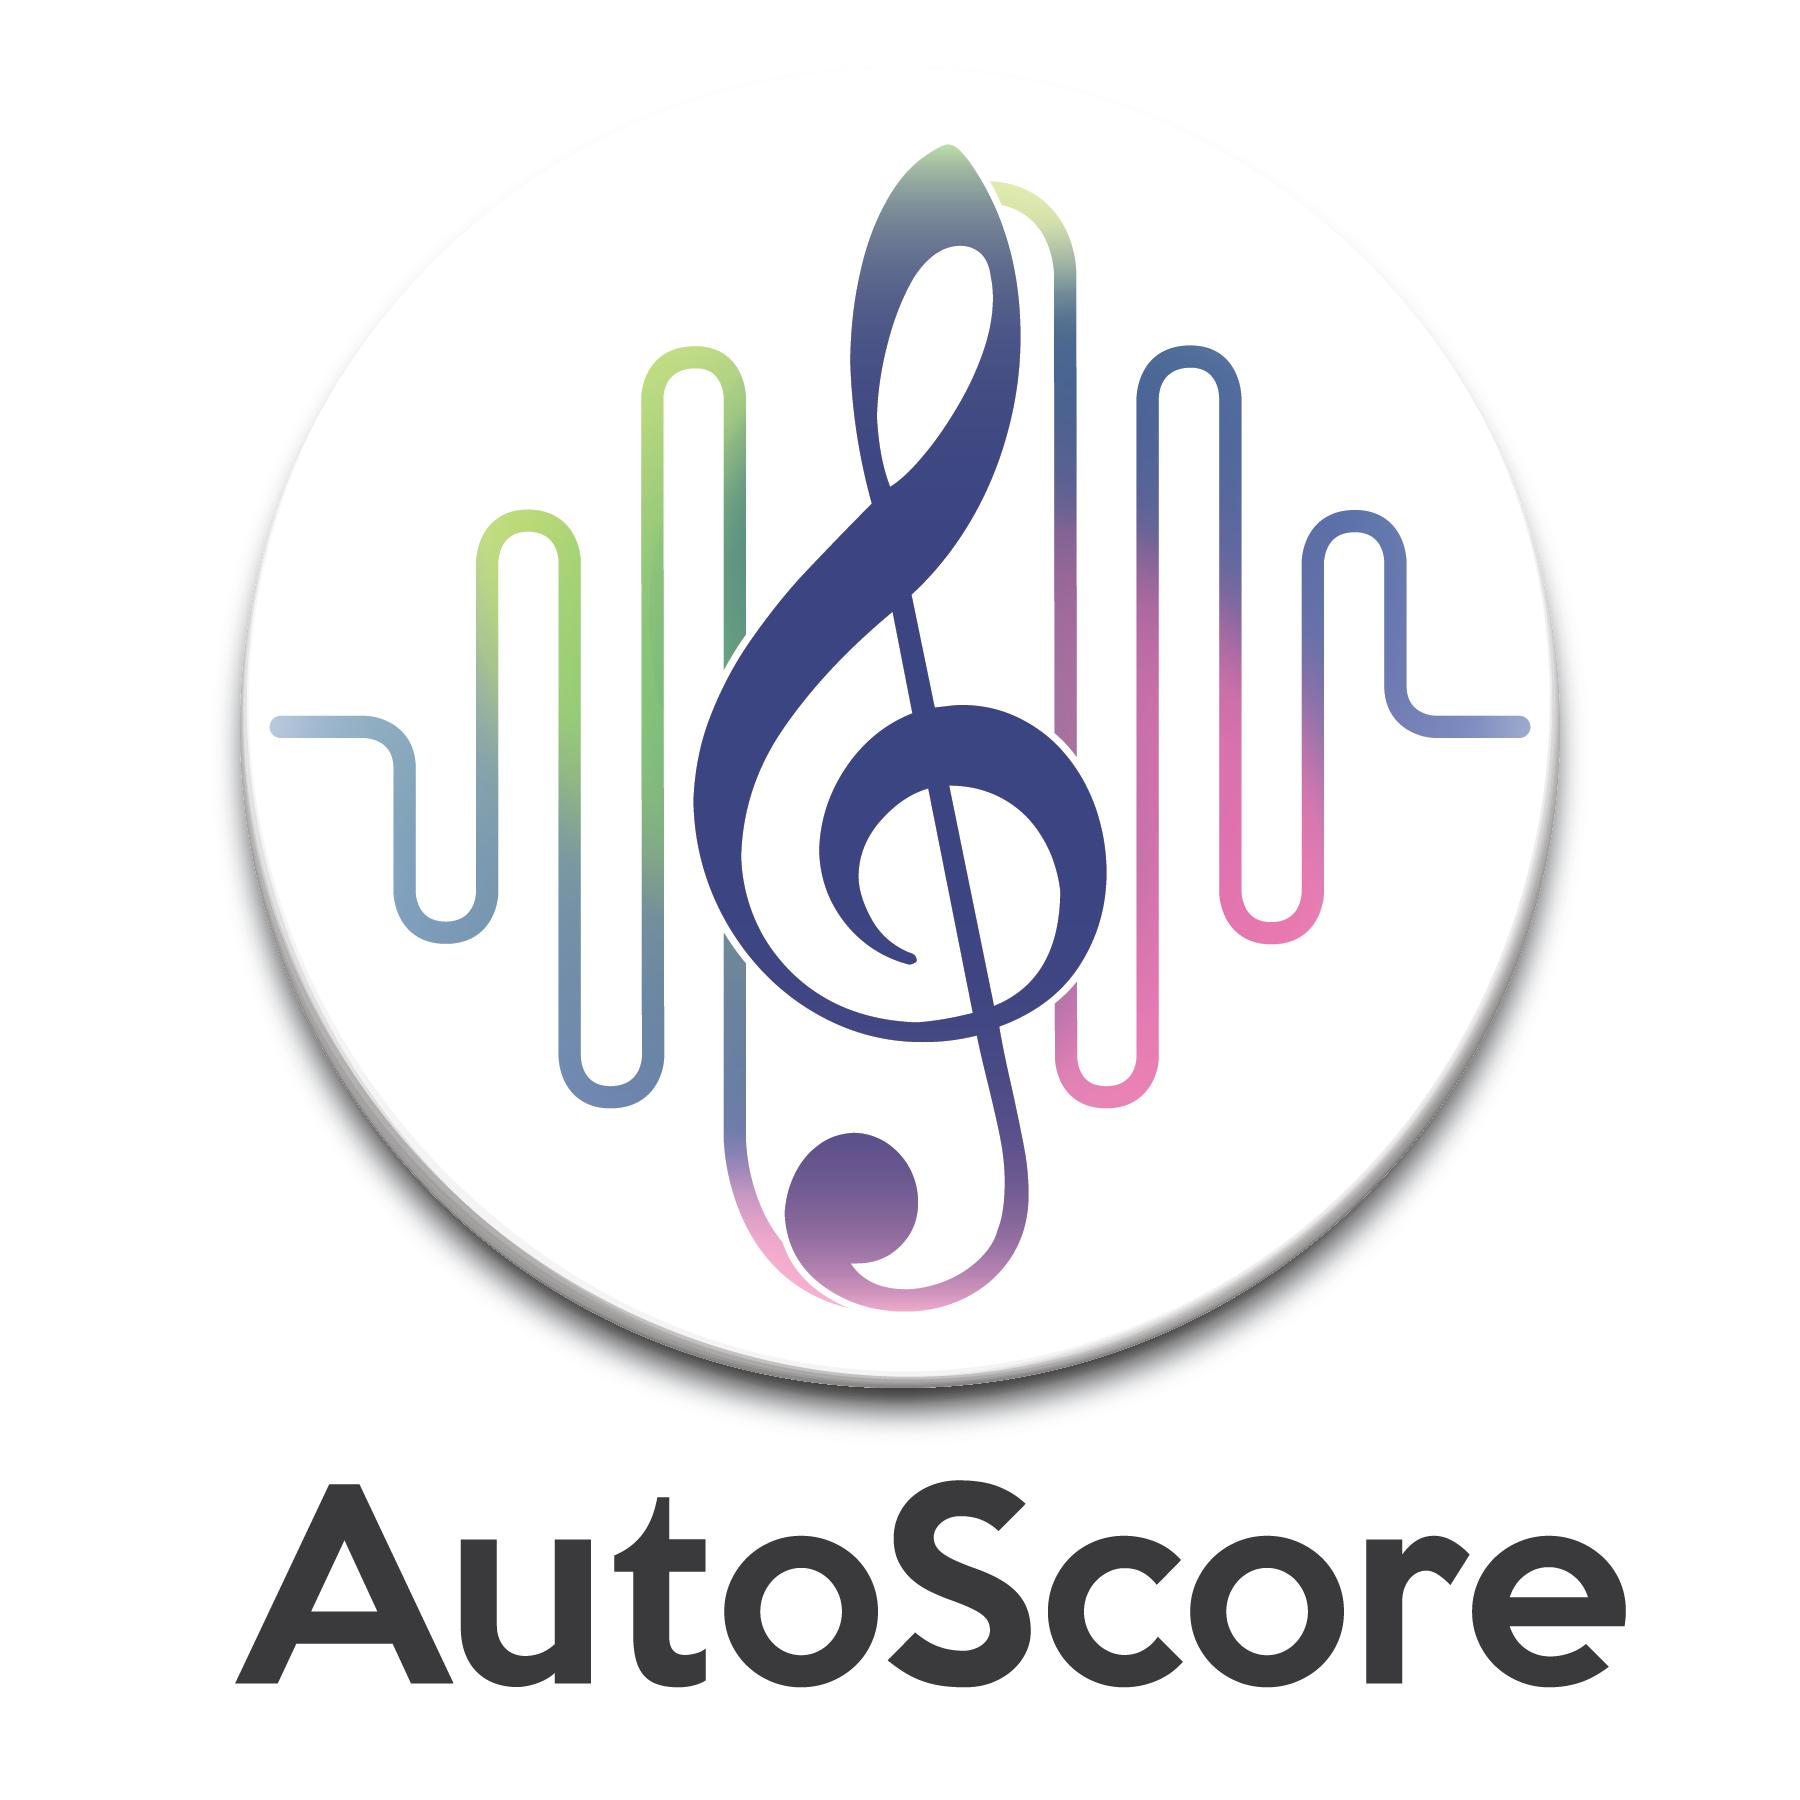 William M Wallace | contact@williammw com - AutoScore